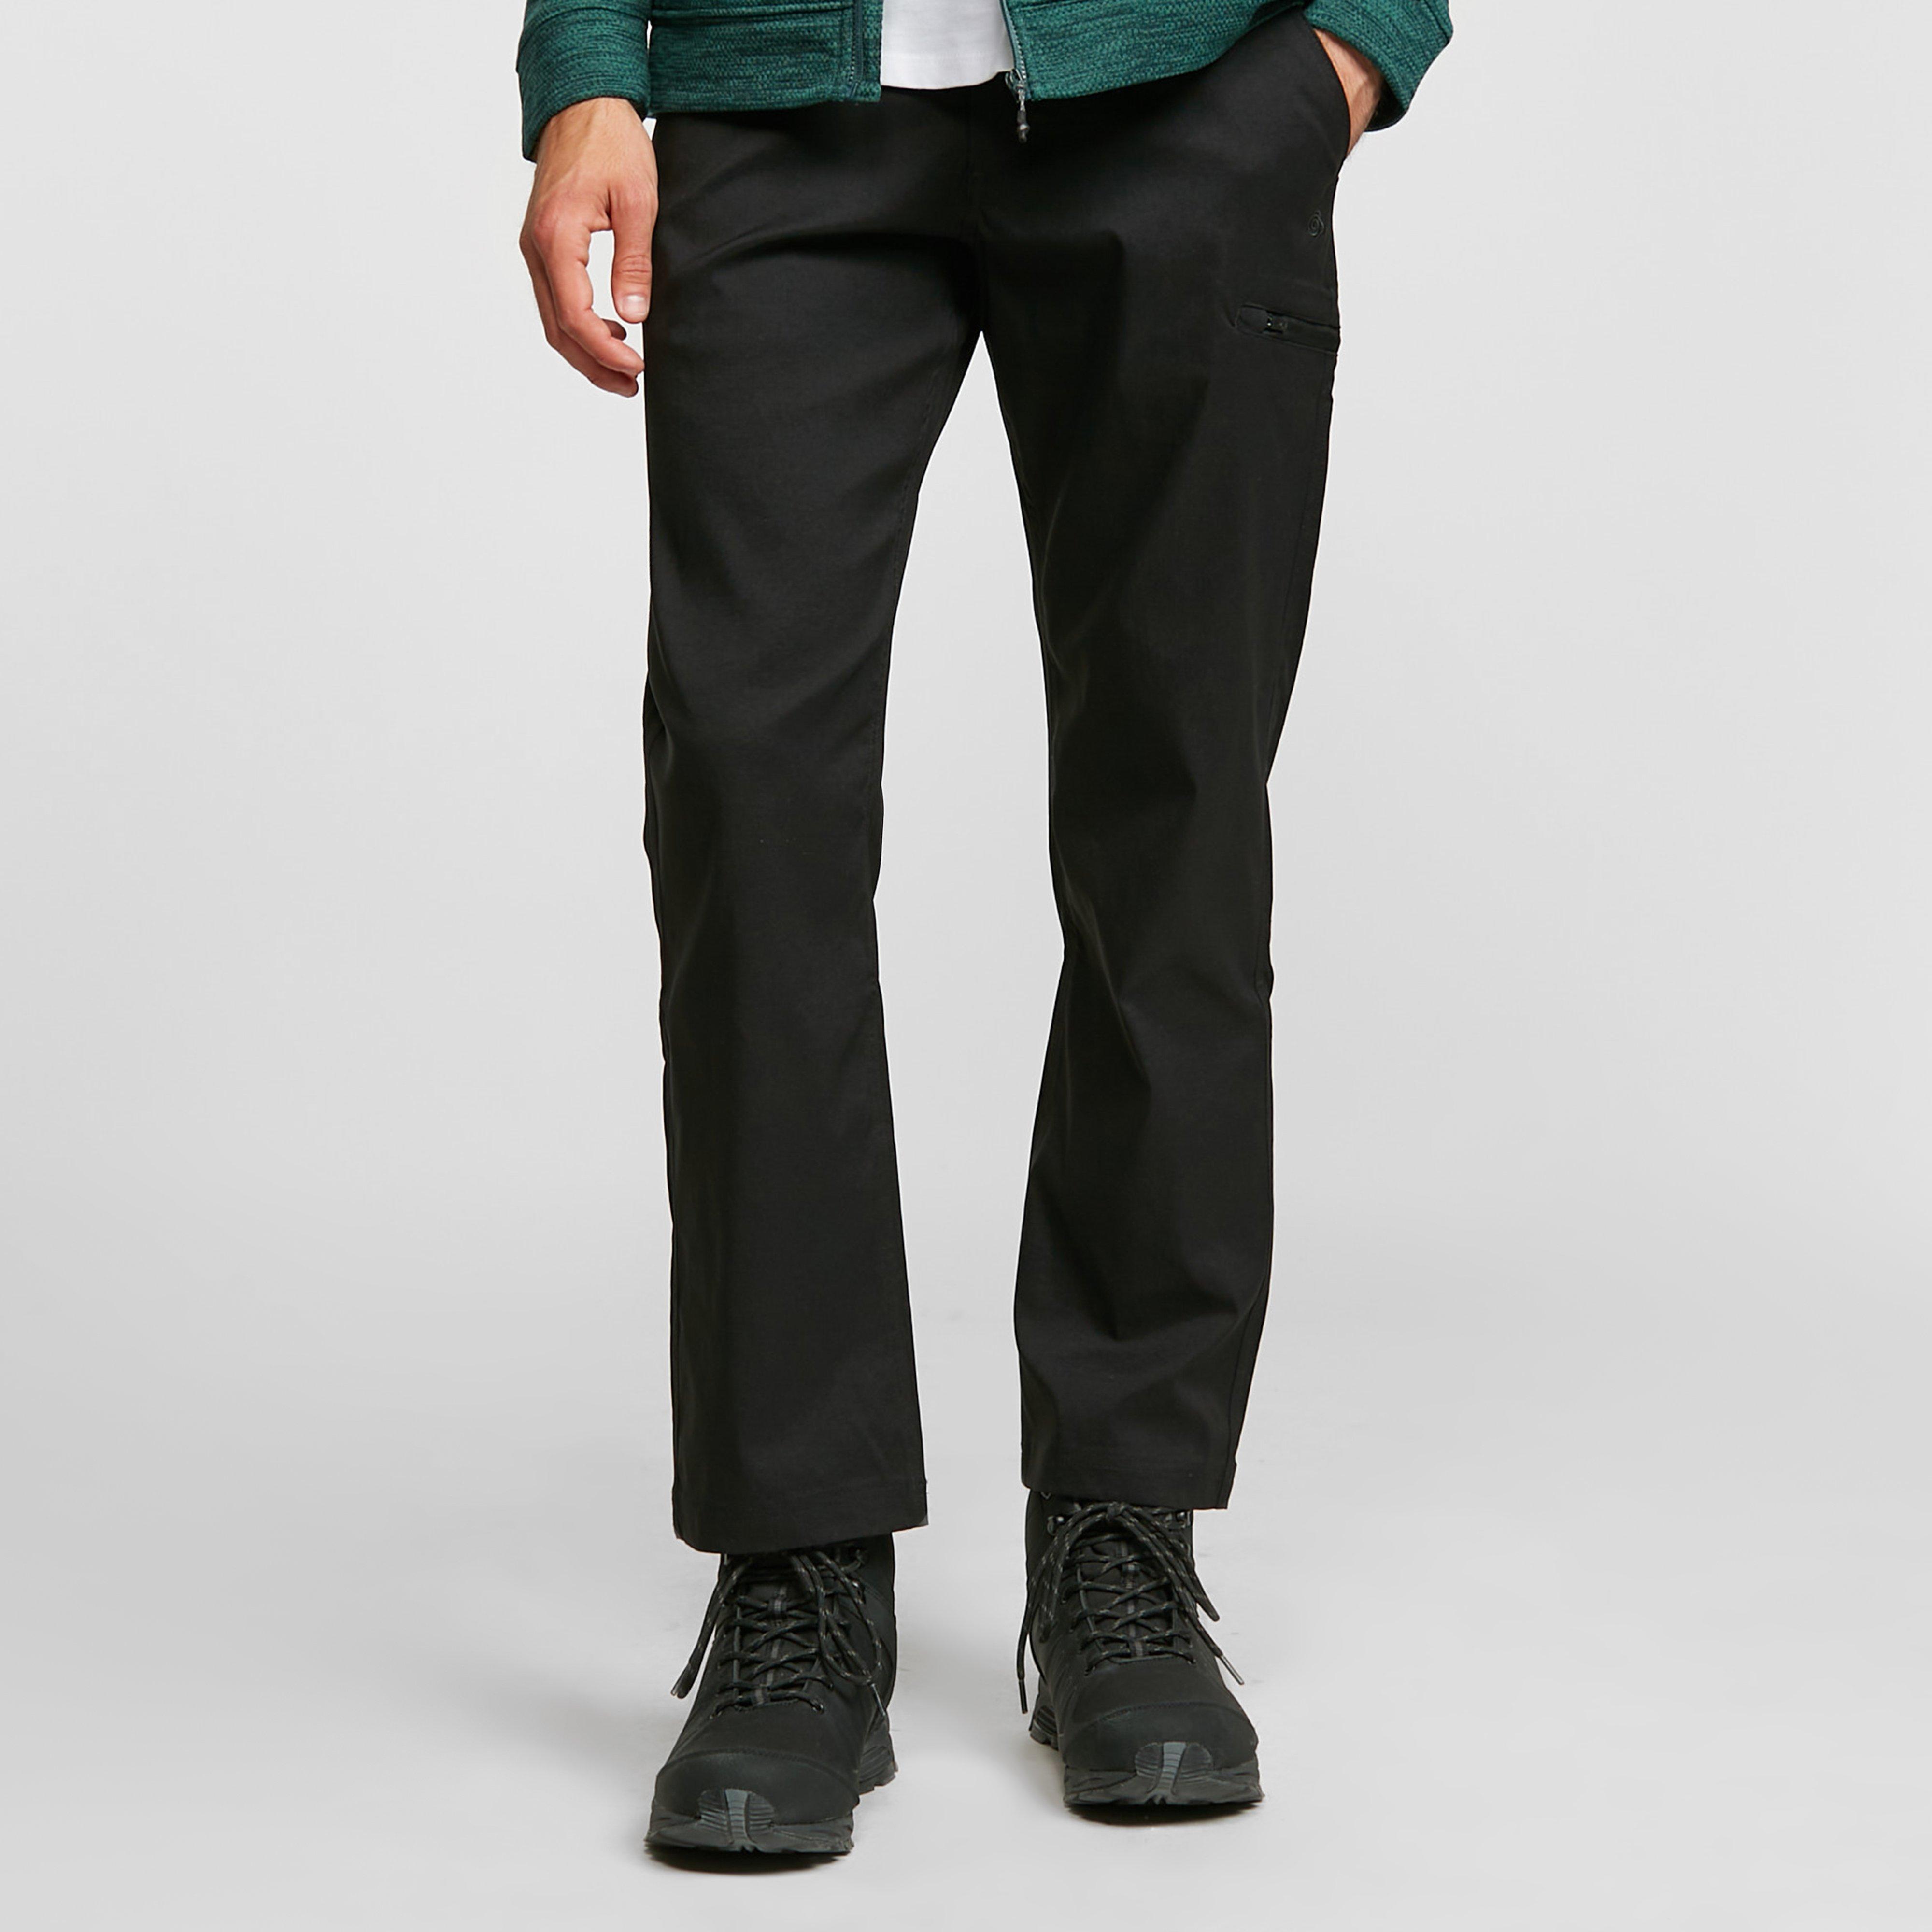 Craghoppers Craghoppers Mens Kiwi Pro Stretch Trousers (Short), Black